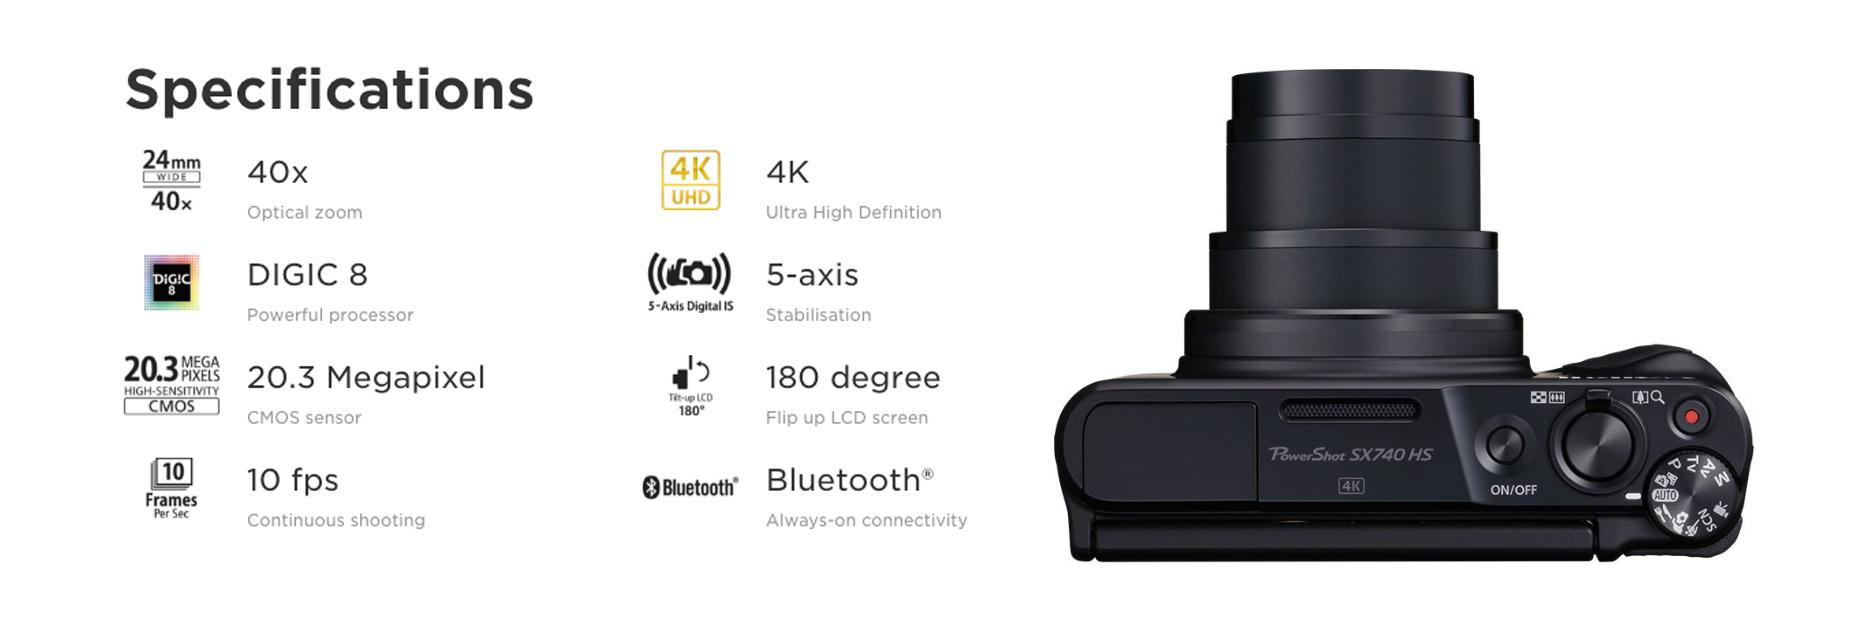 Spec-SX740-HS.jpg